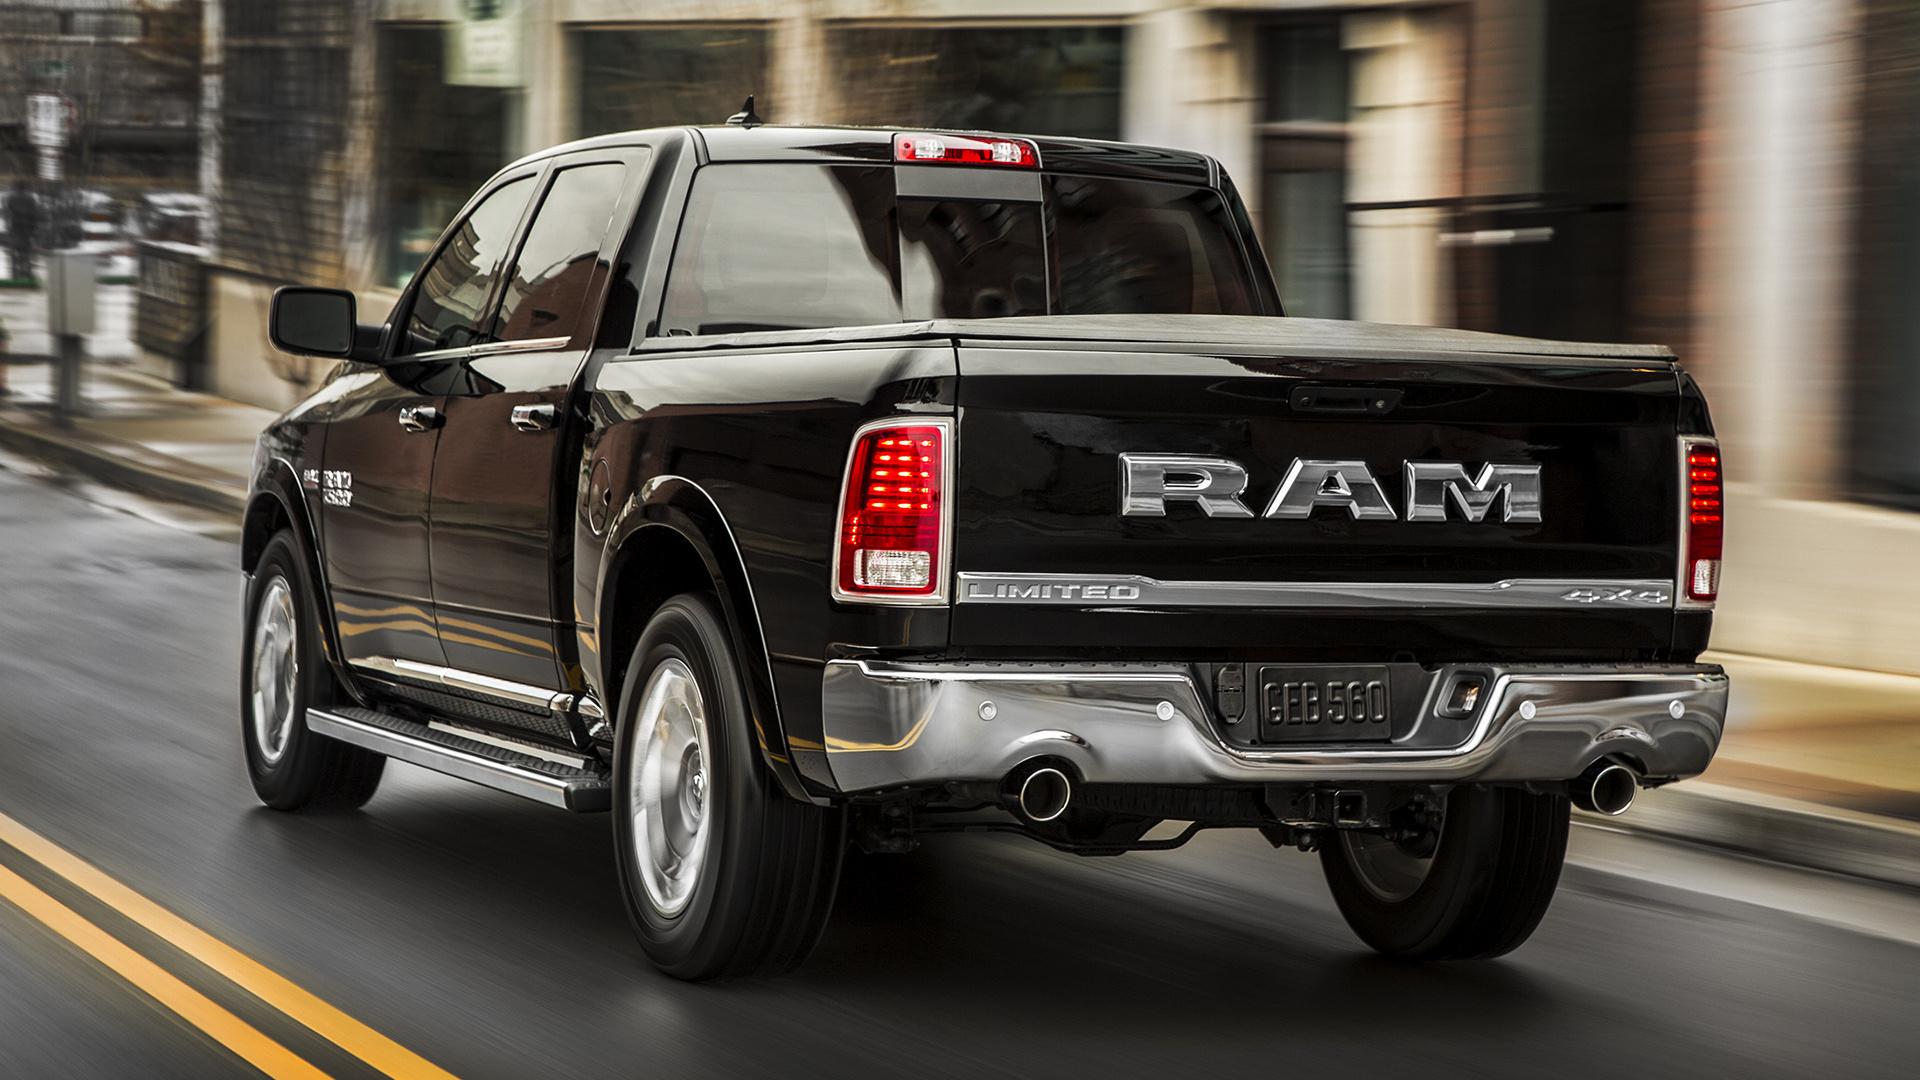 Toyota Of Laramie >> 2015 Ram 1500 Laramie Limited Crew Cab - Wallpapers and HD ...